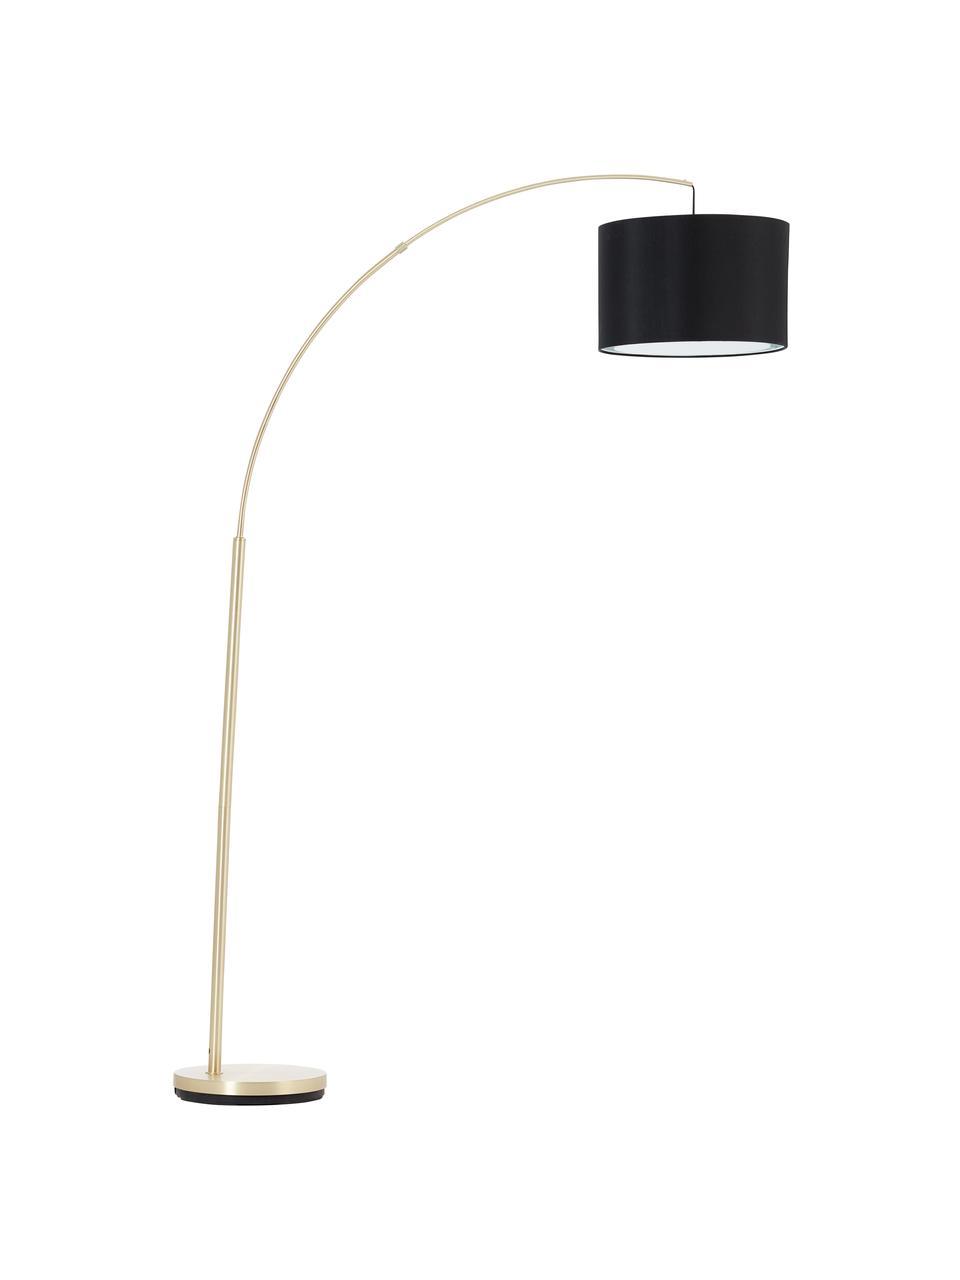 Große Bogenlampe Clarie in Messing, Lampenschirm: Textil, Lampenfuß: Metall, gebürstet, Schwarz, Messingfarben, 113 x 180 cm